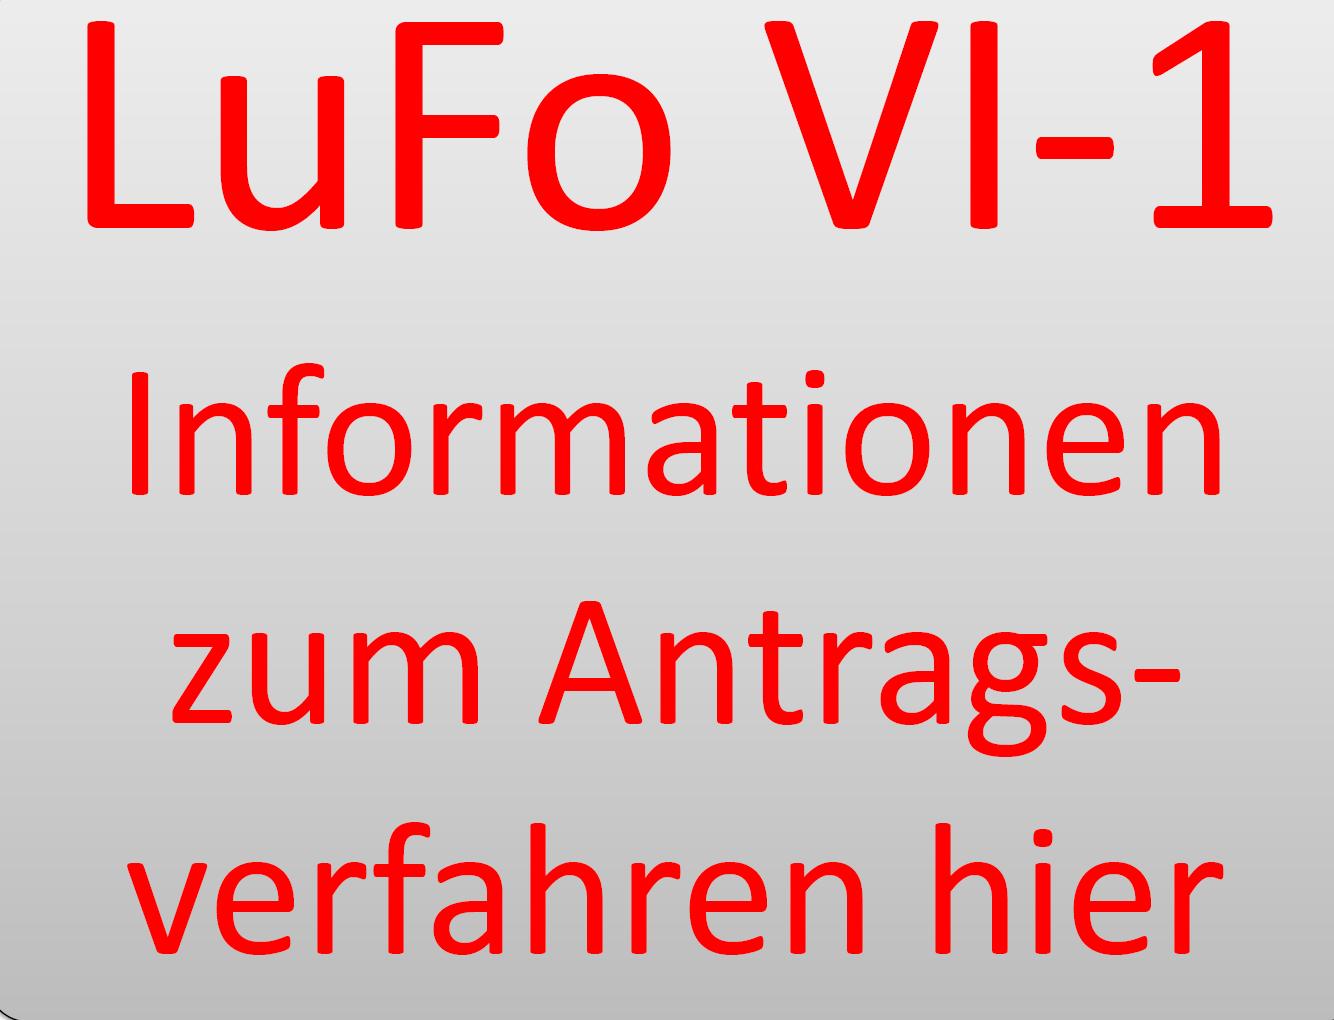 Lufo_VI-1_Teaser_Antragsverfahren